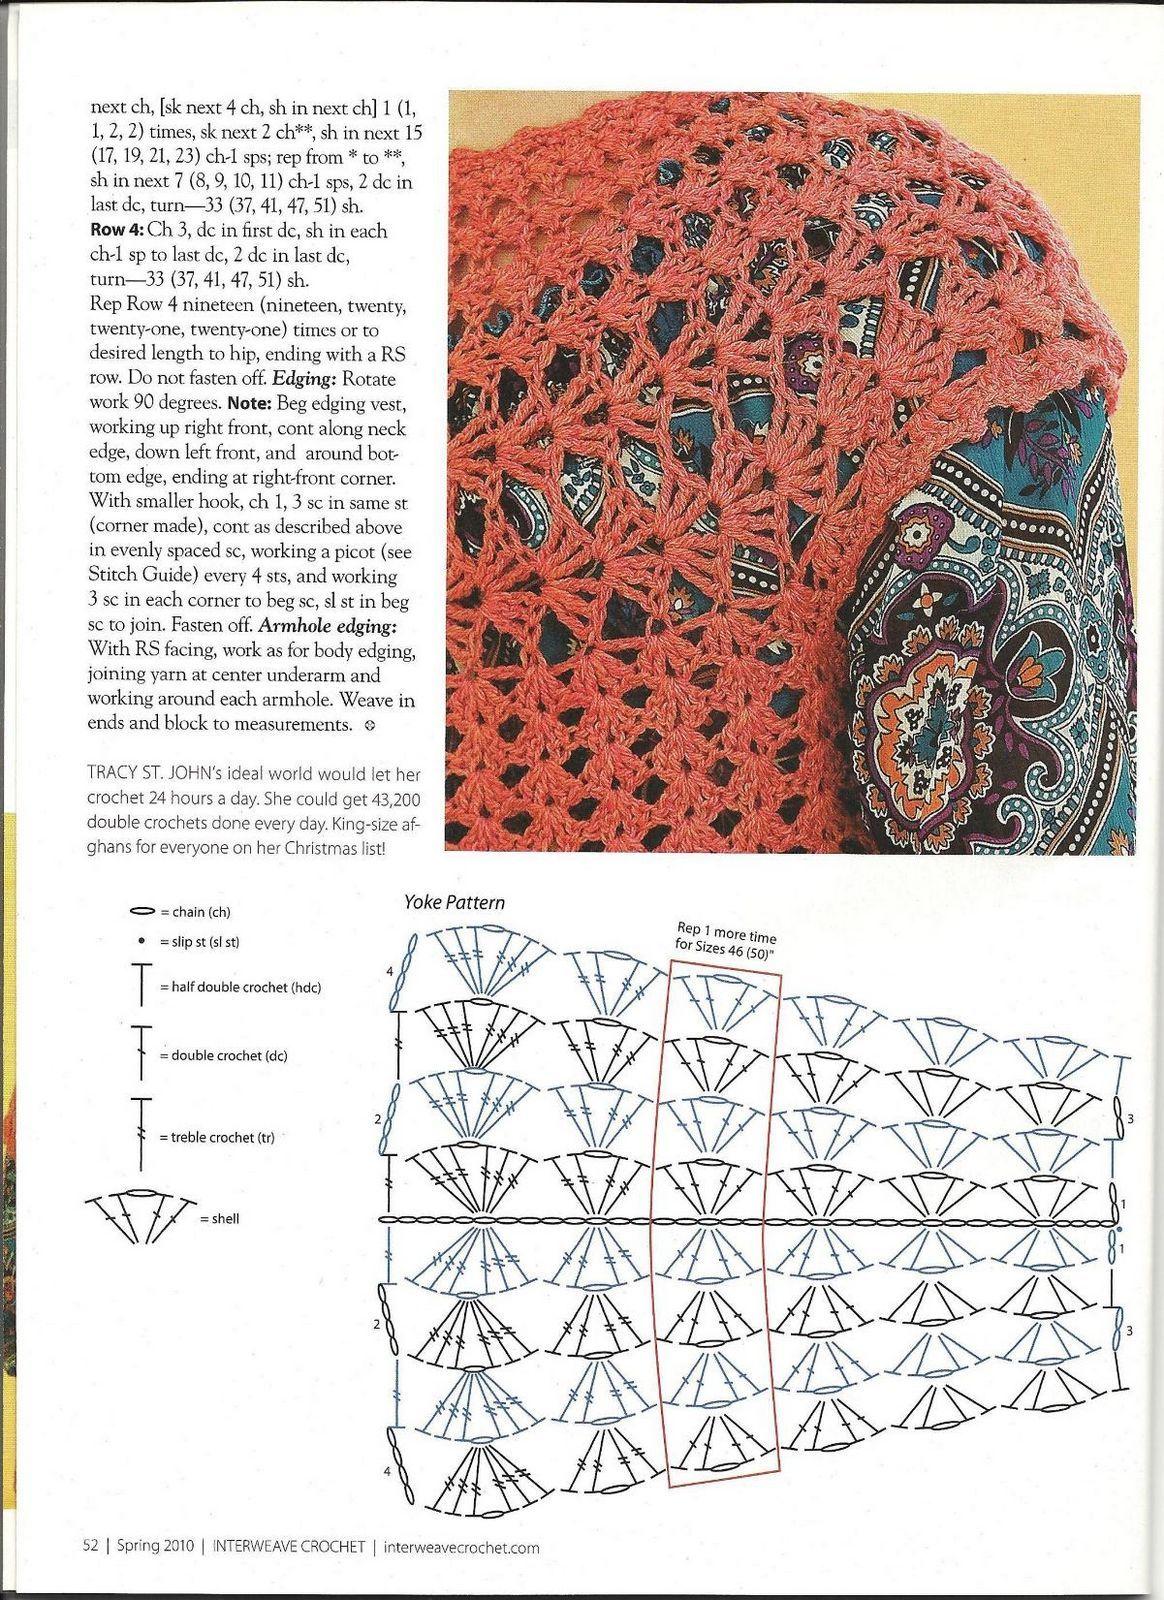 Pin de silvia espinosa en Diagramas de croché   Pinterest   Patrones